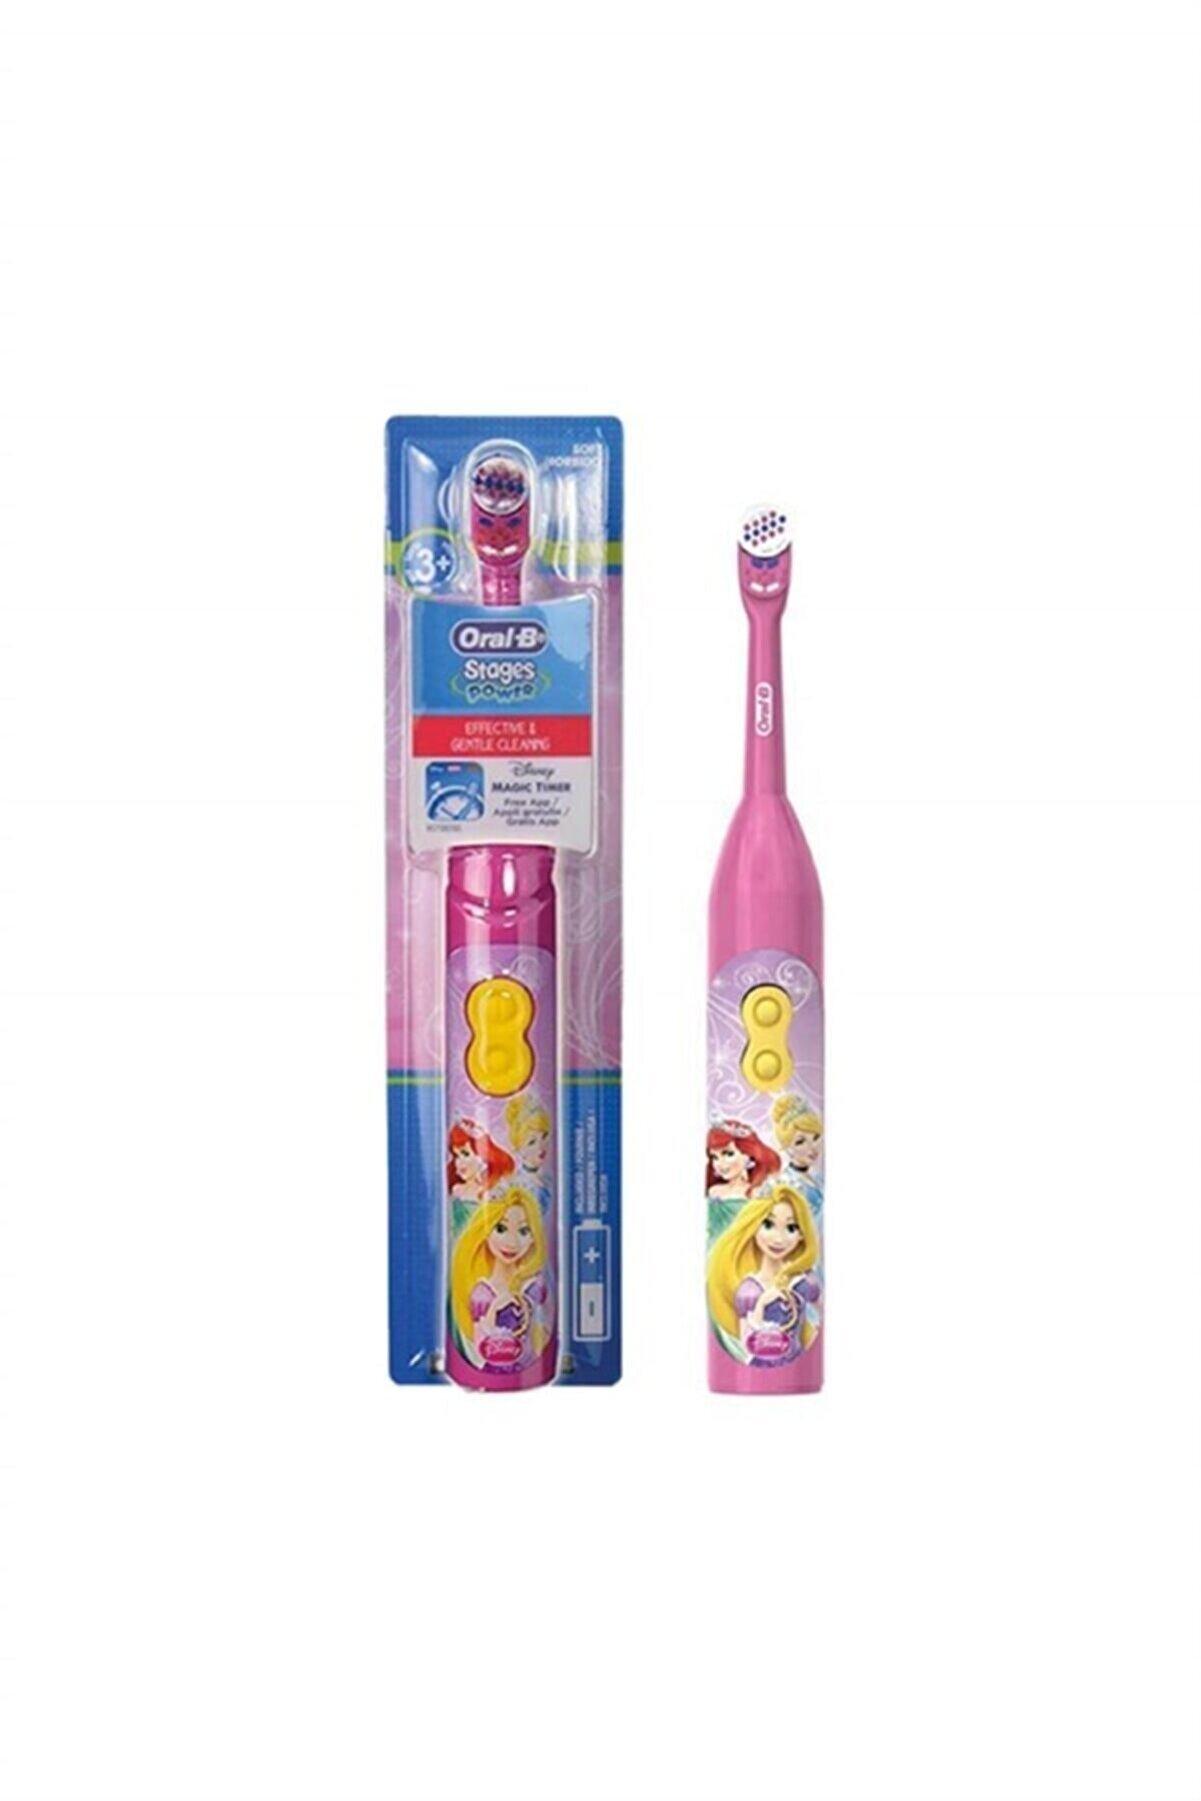 Oral-B Stages Power Çocuk Pilli Diş Fırçası Frozen Princess 3+ Ay